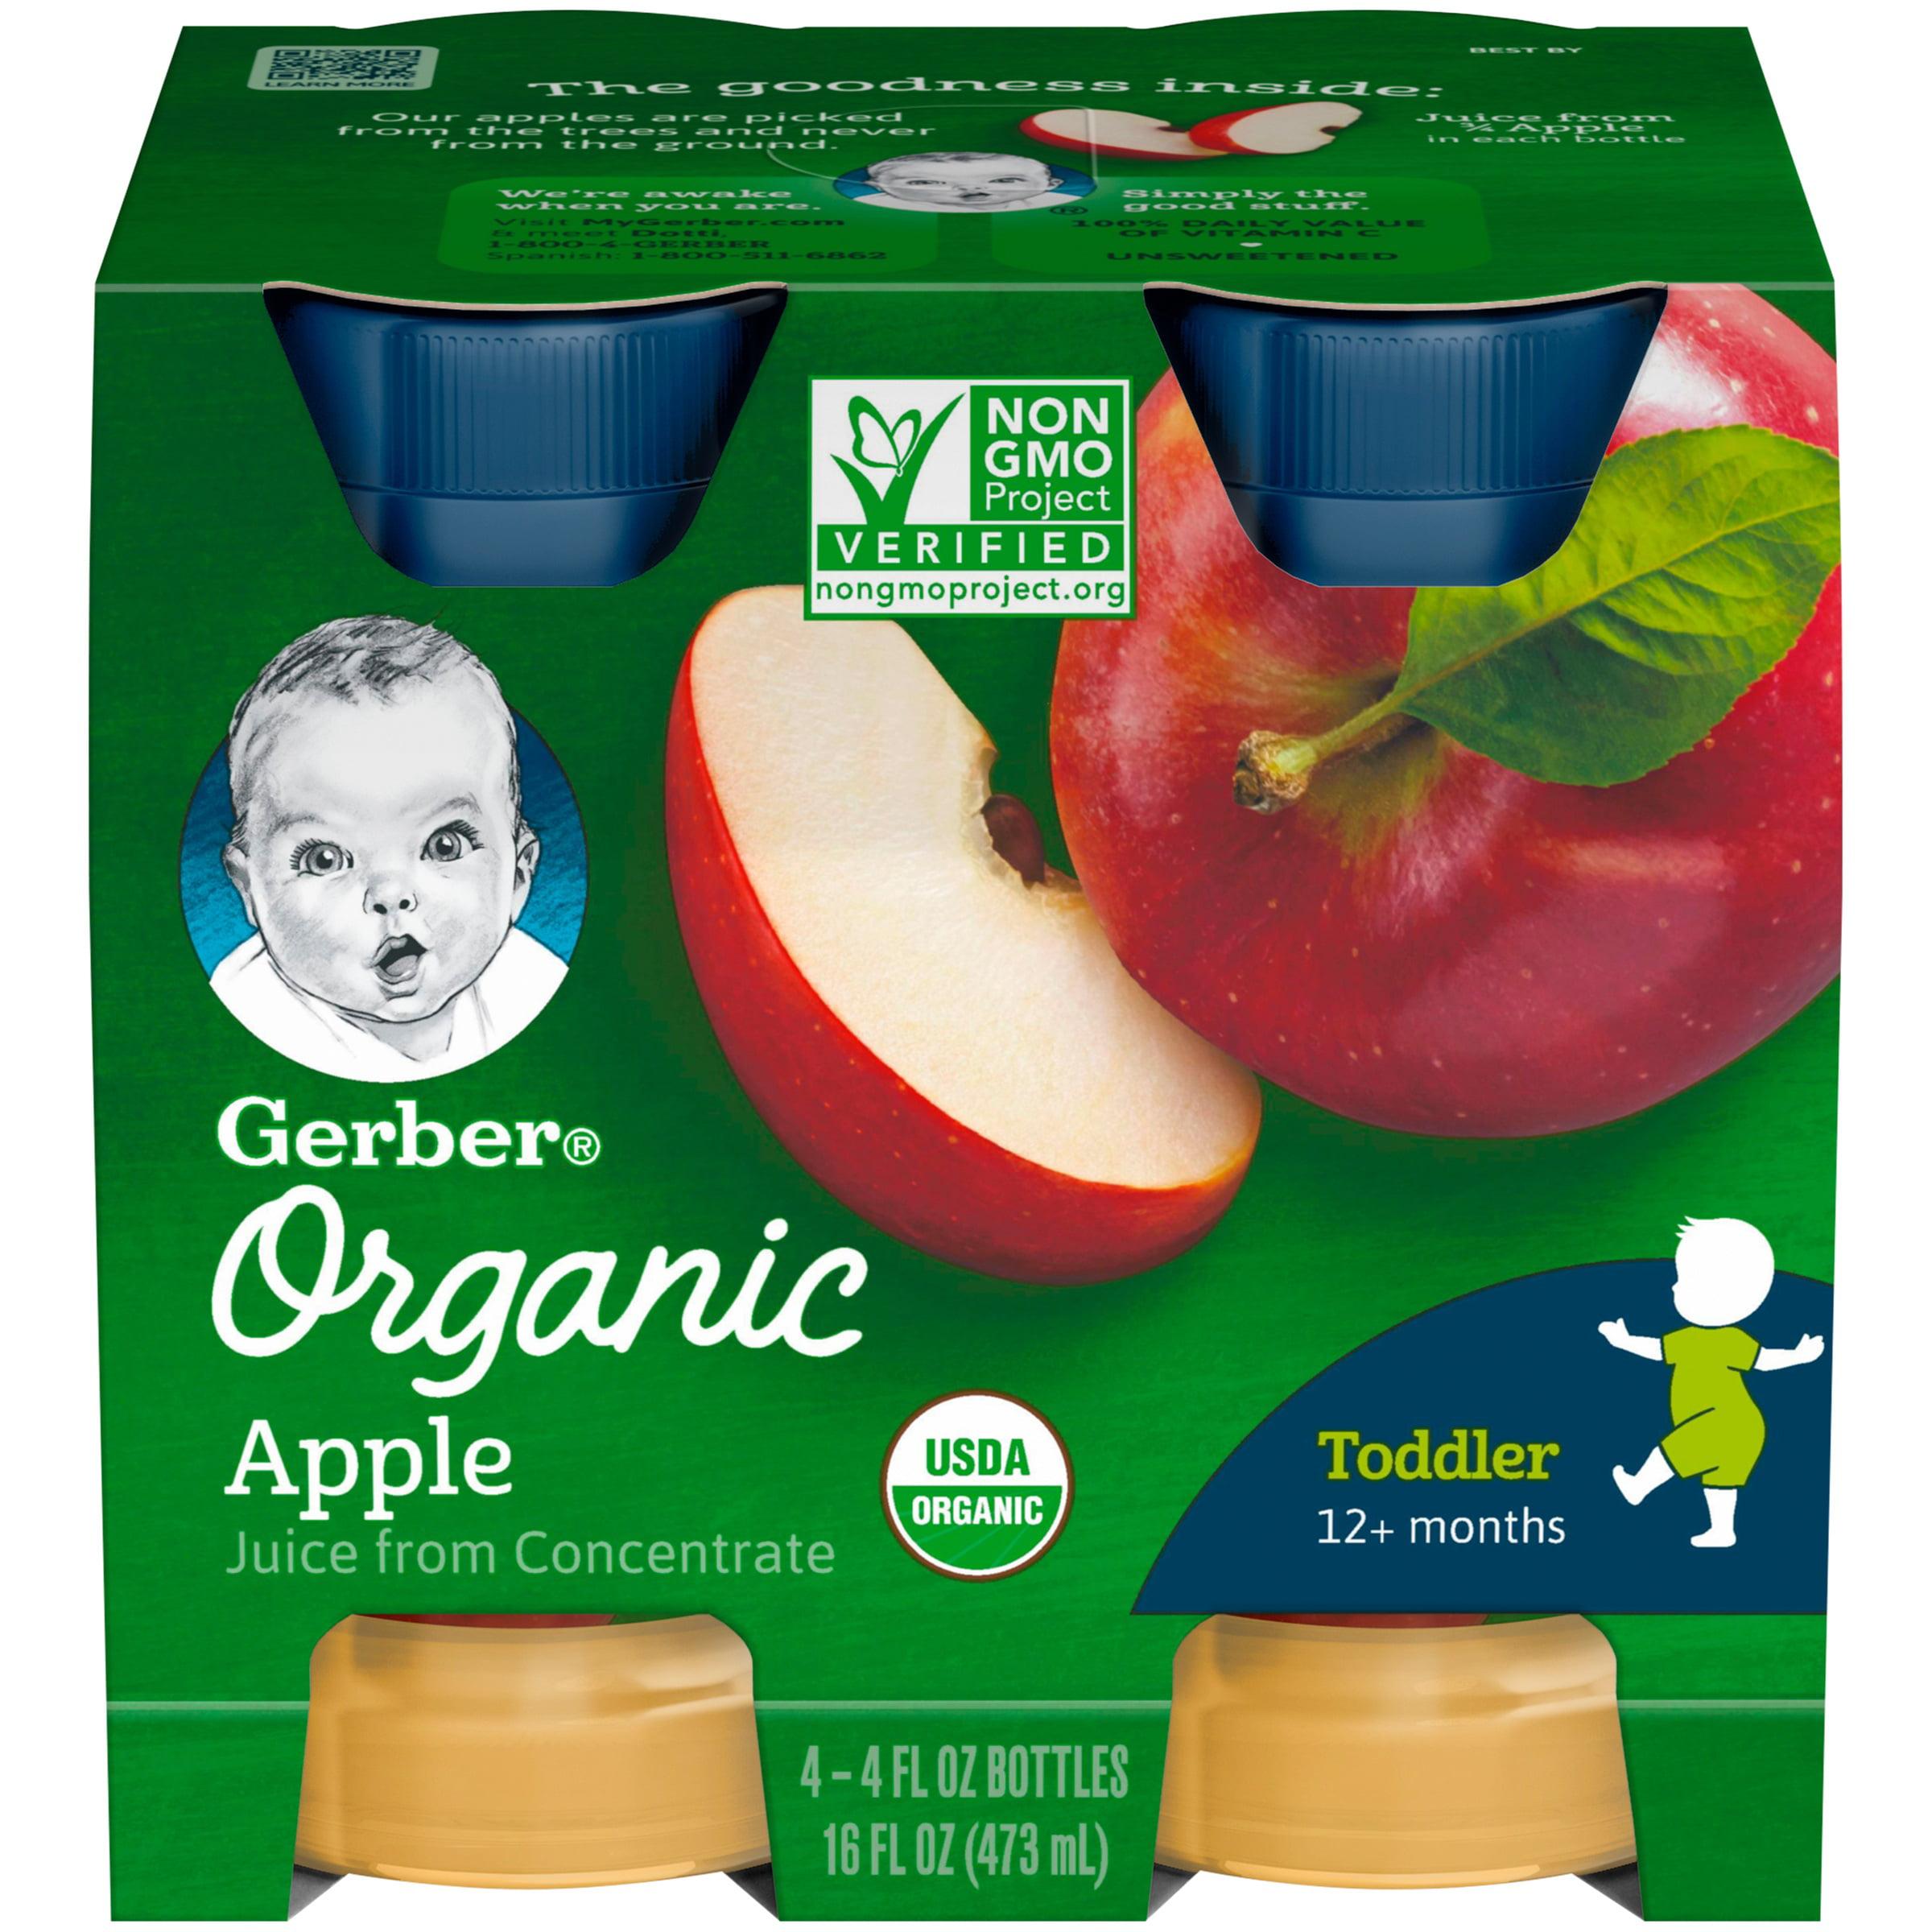 Gerber Organic 100% Apple Juice, 4 fl oz bottle, 4 Count